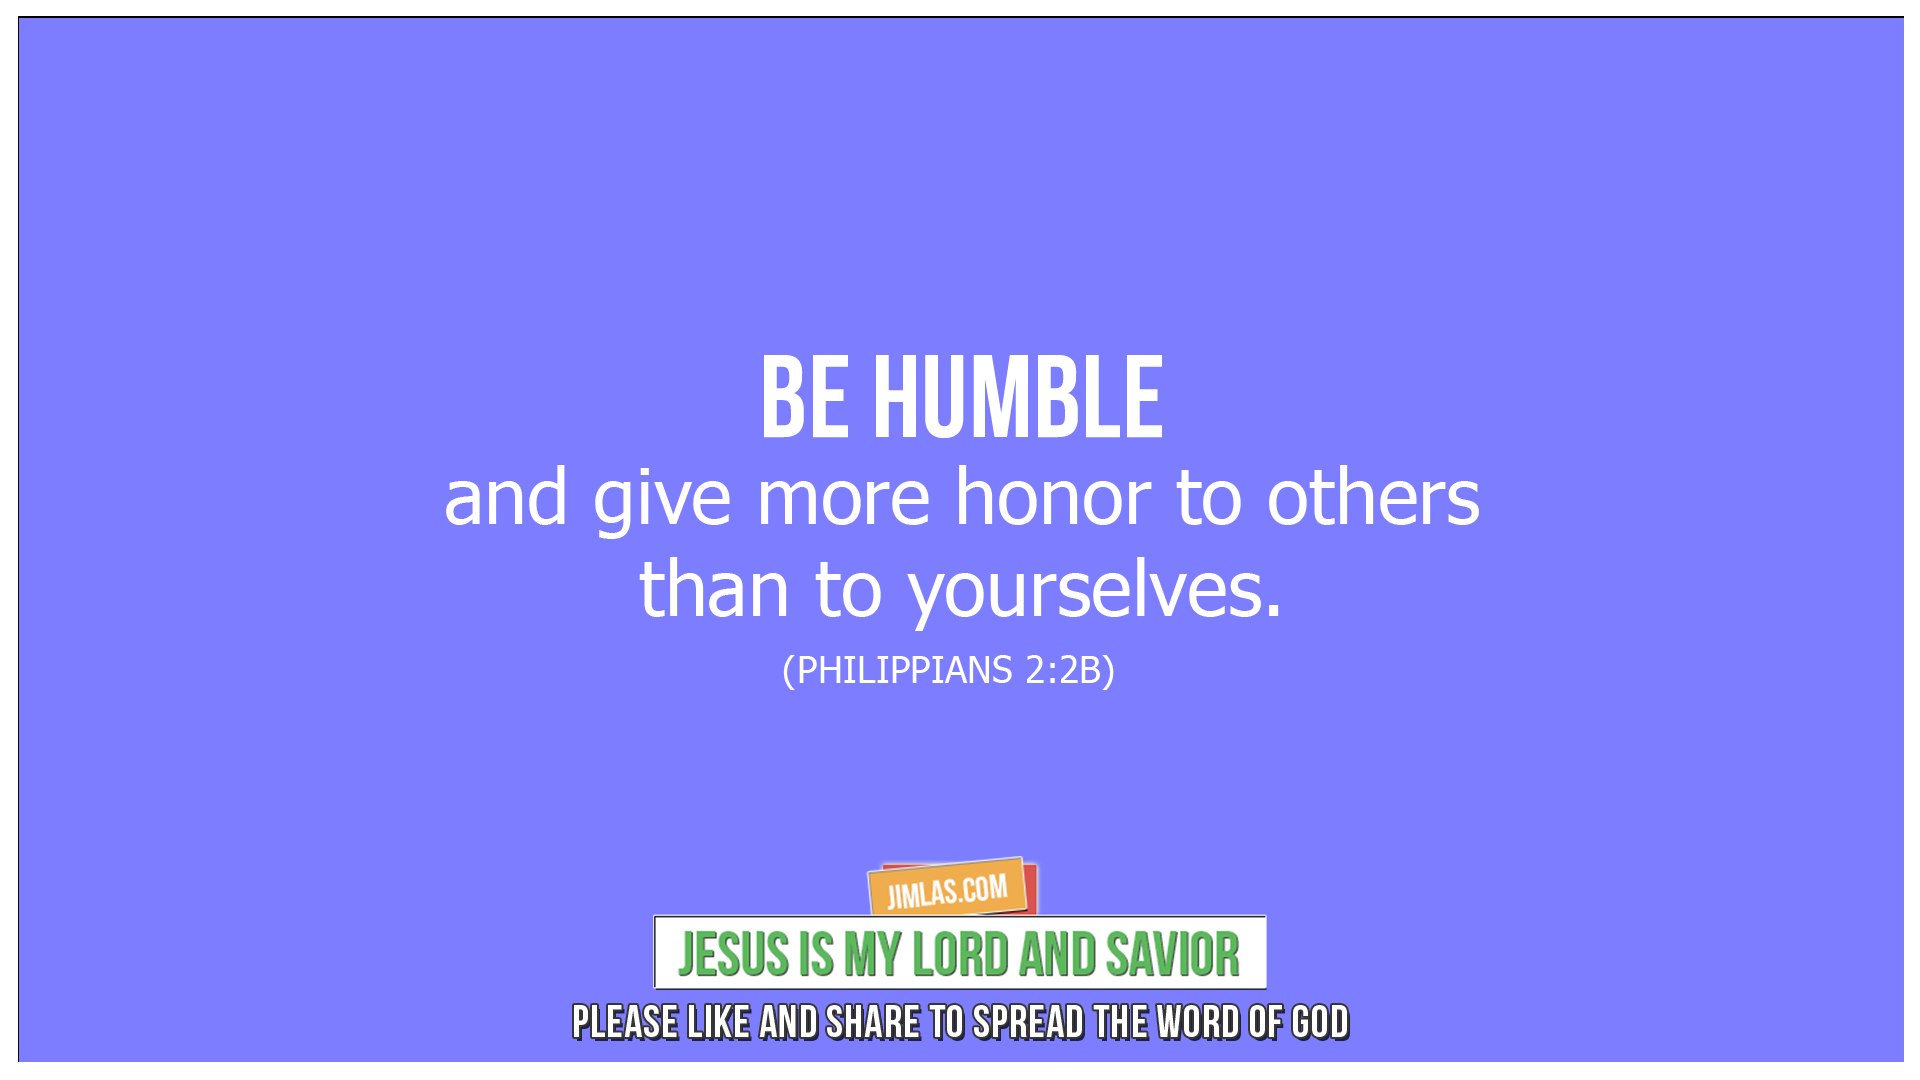 philippians 2 2b, Philippians 2:2B